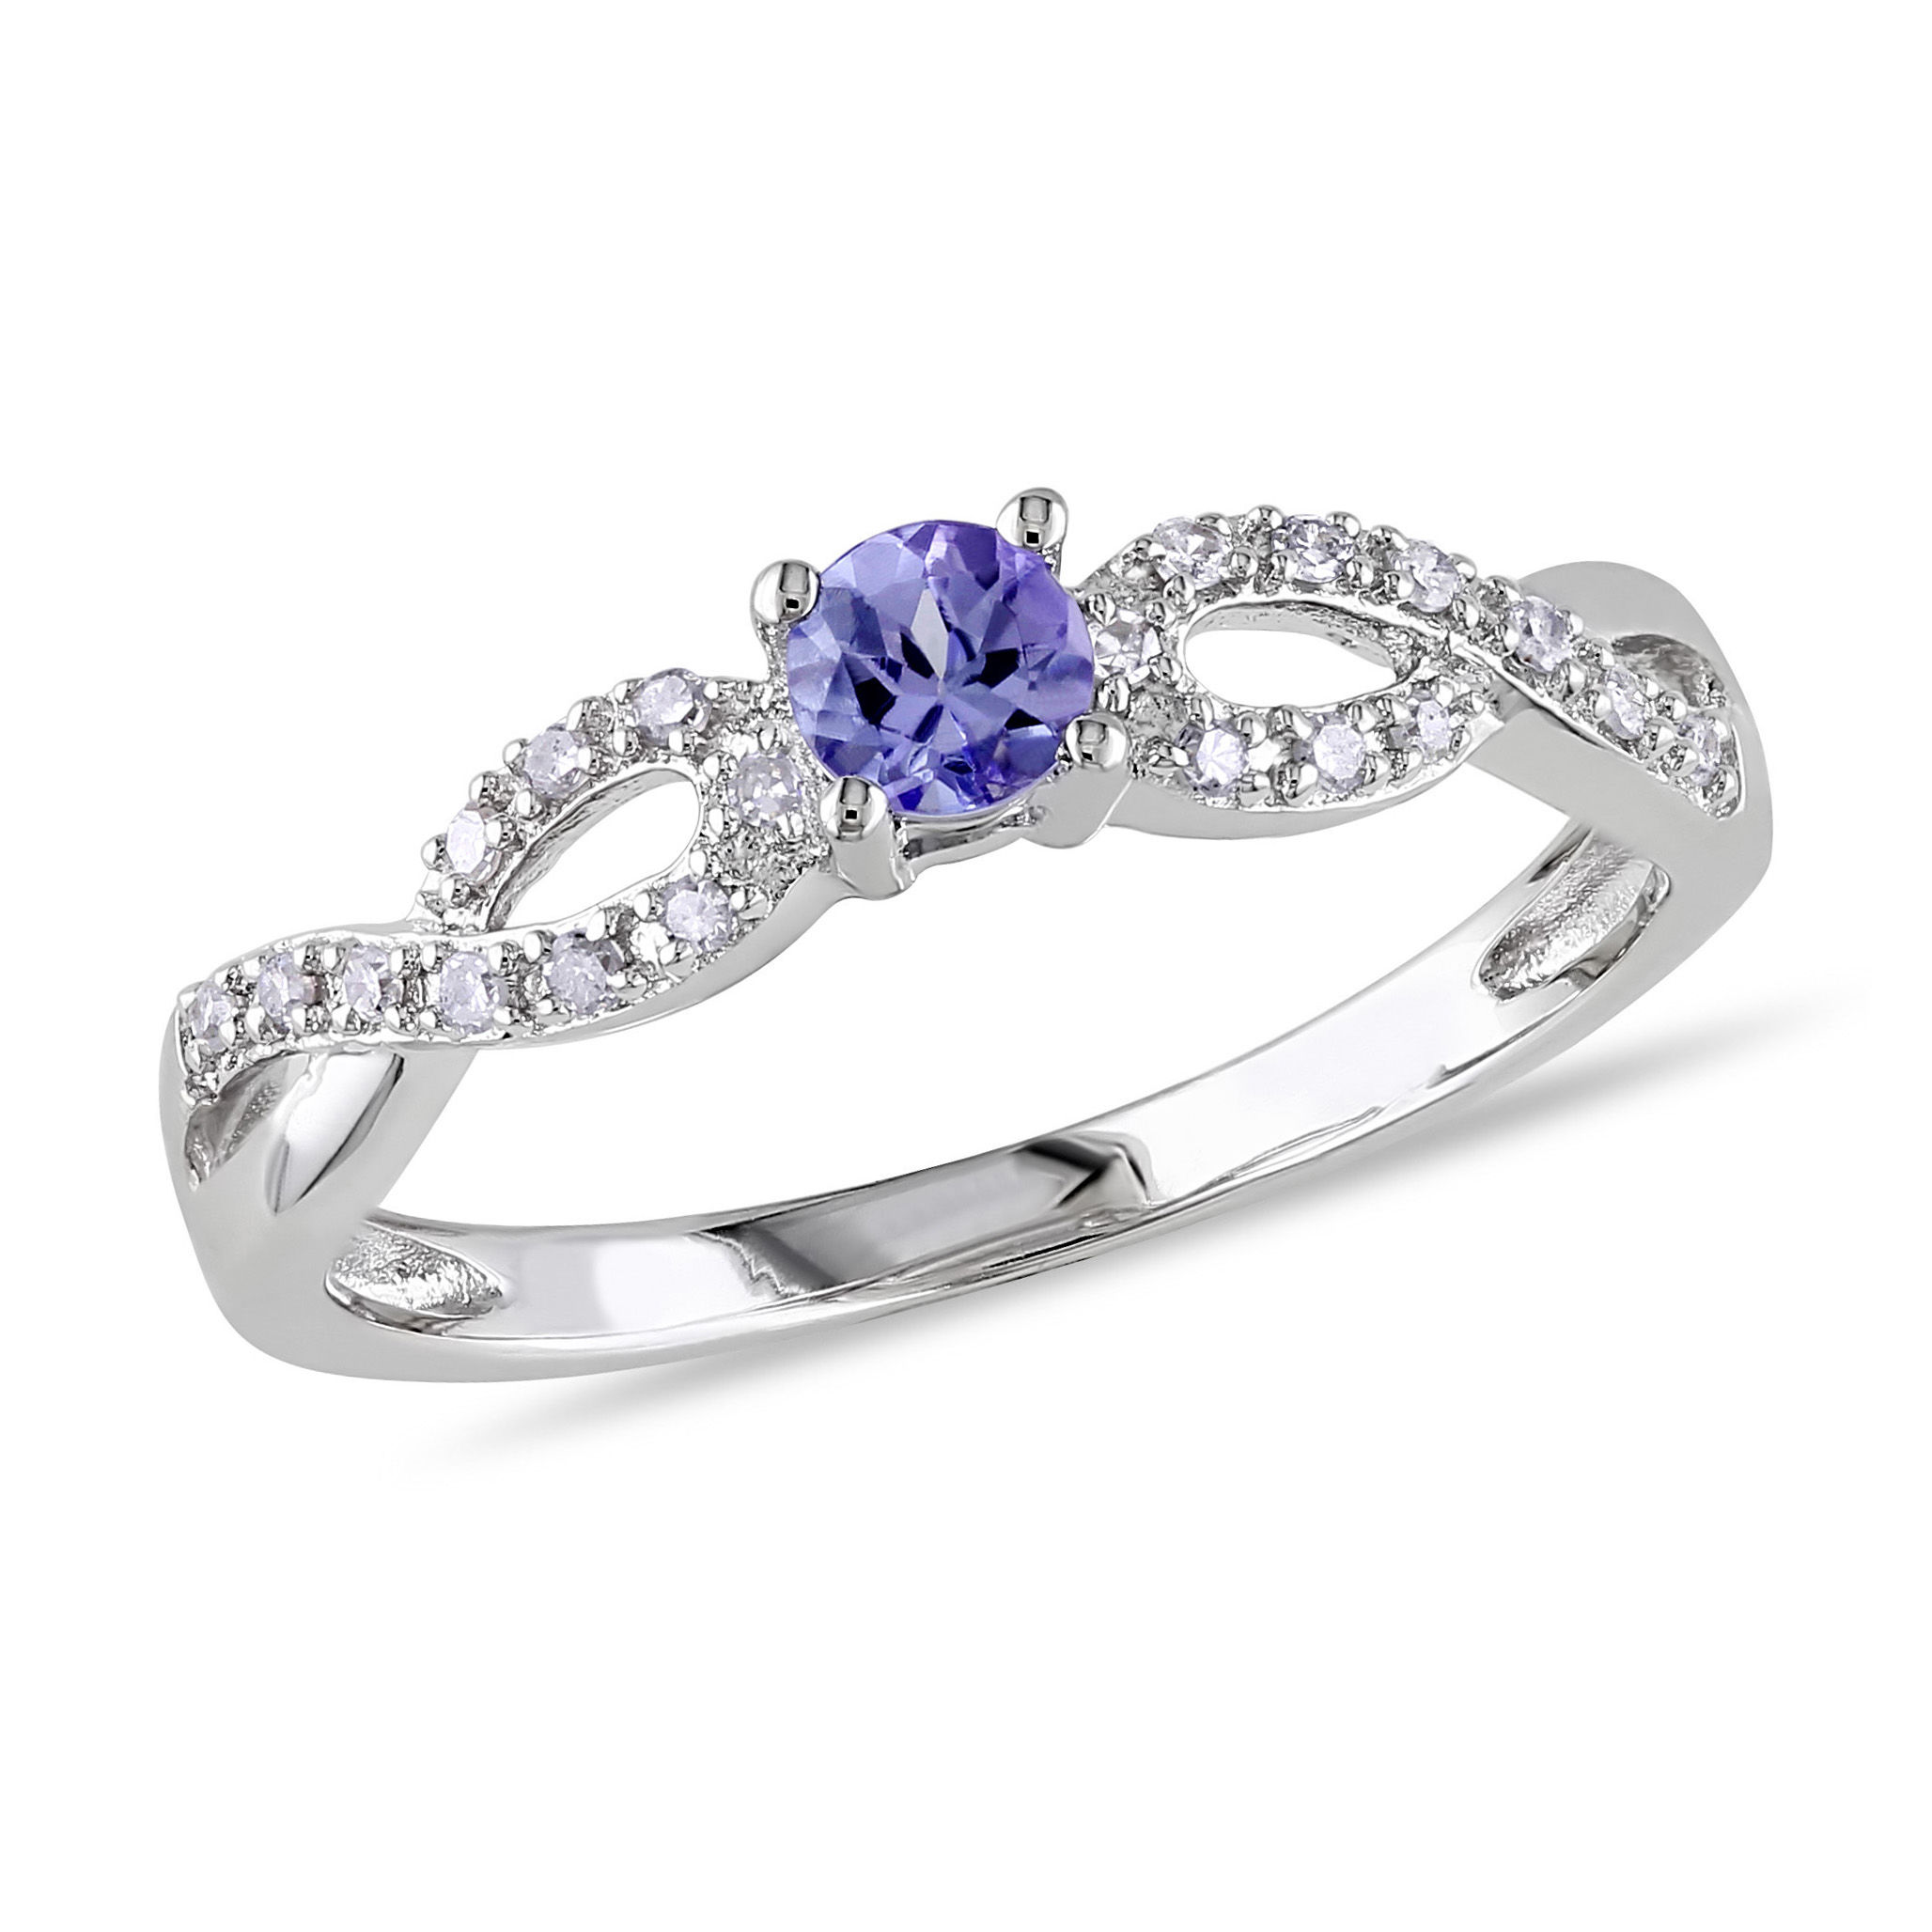 1/10 CT Diamond TW And 1/6 CT TGW Tanzanite Ring Silver